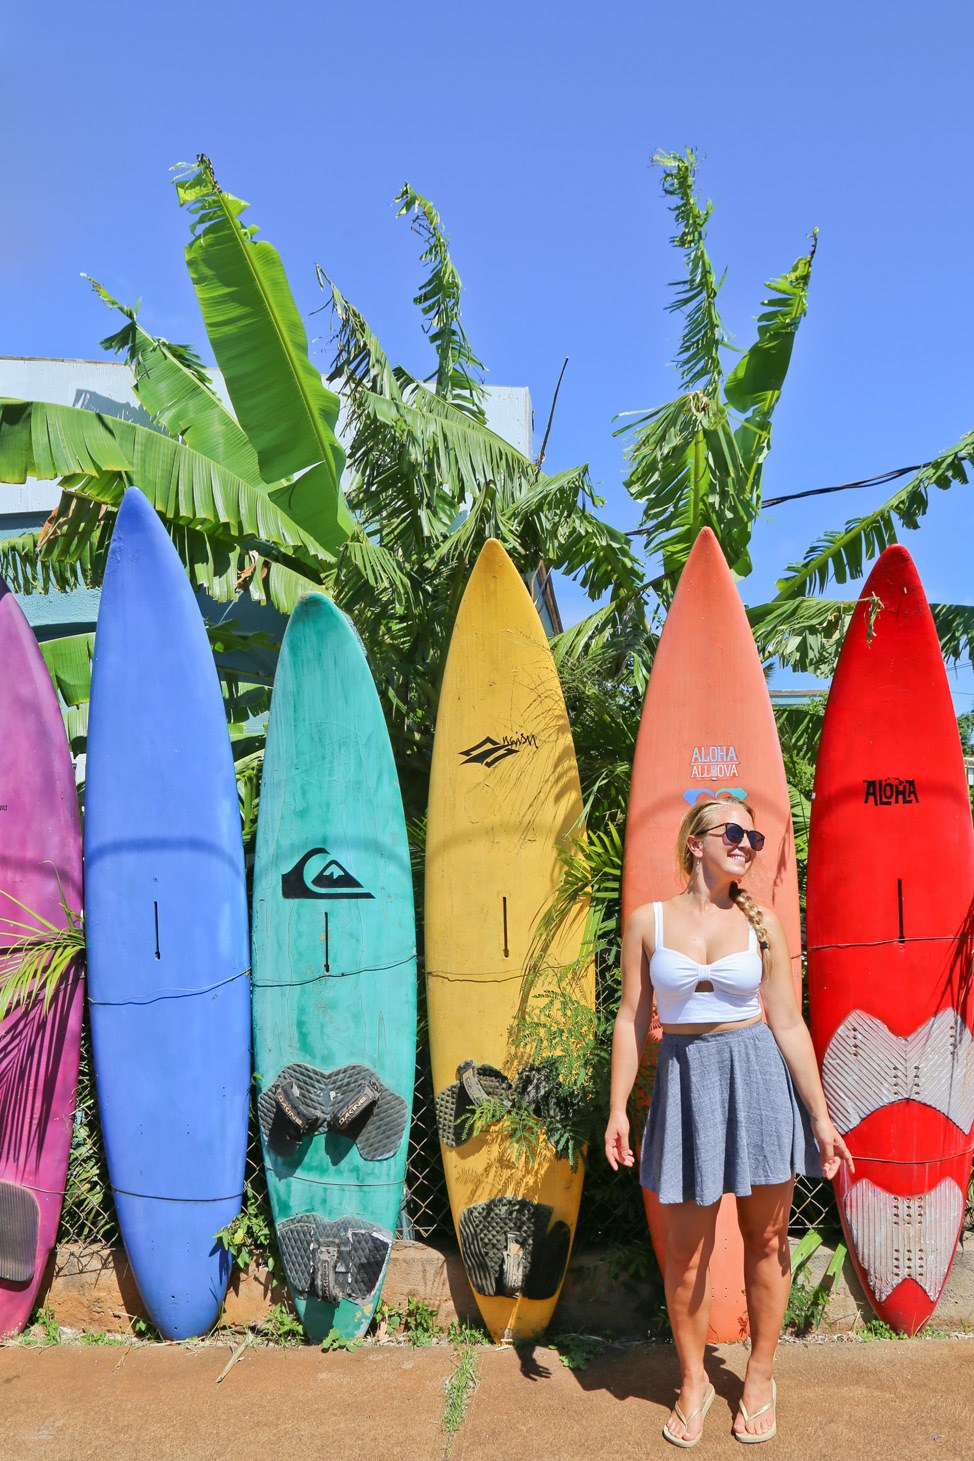 Hawaii Travel Blog Review